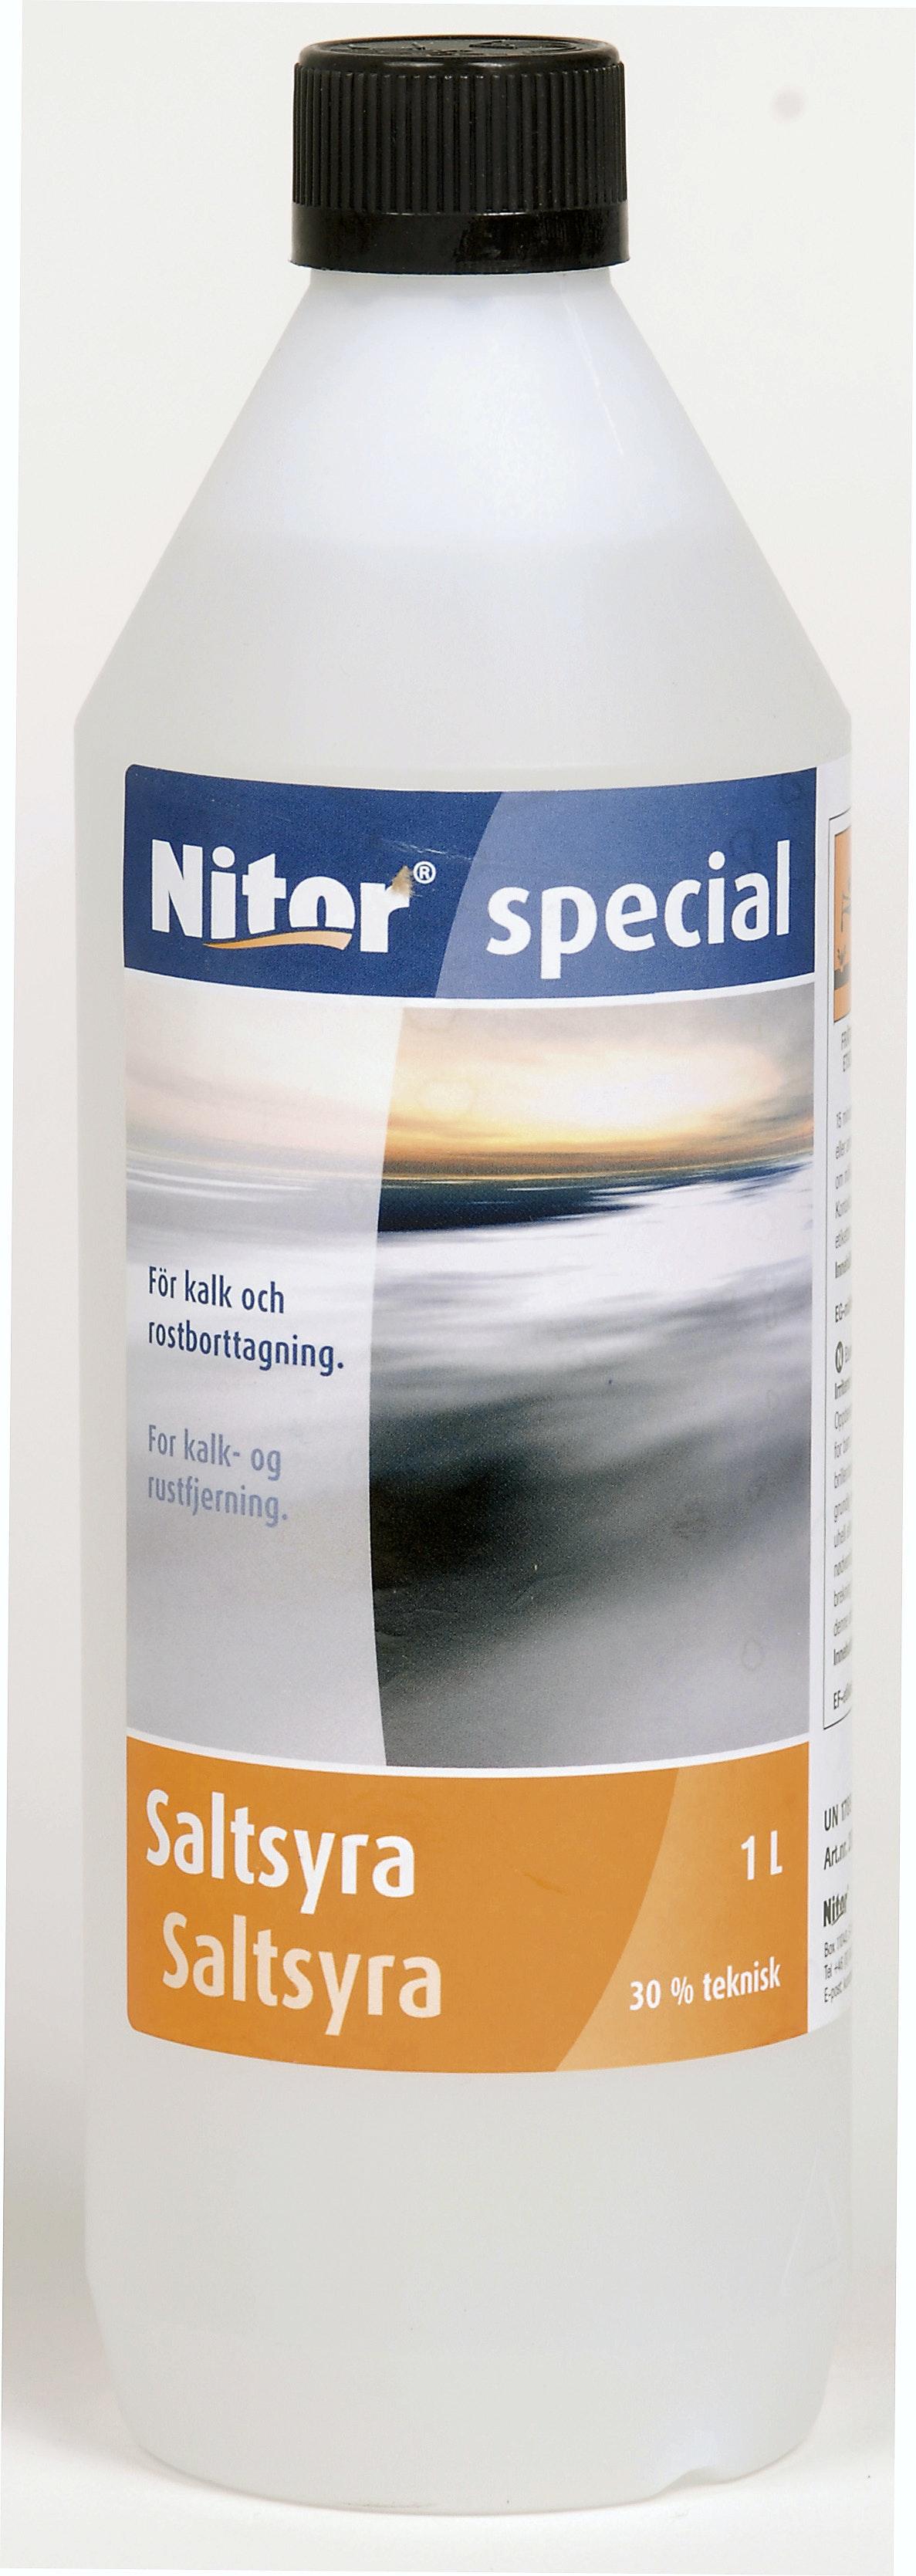 Saltsyra Nitor 1,3 Teknisk 1l